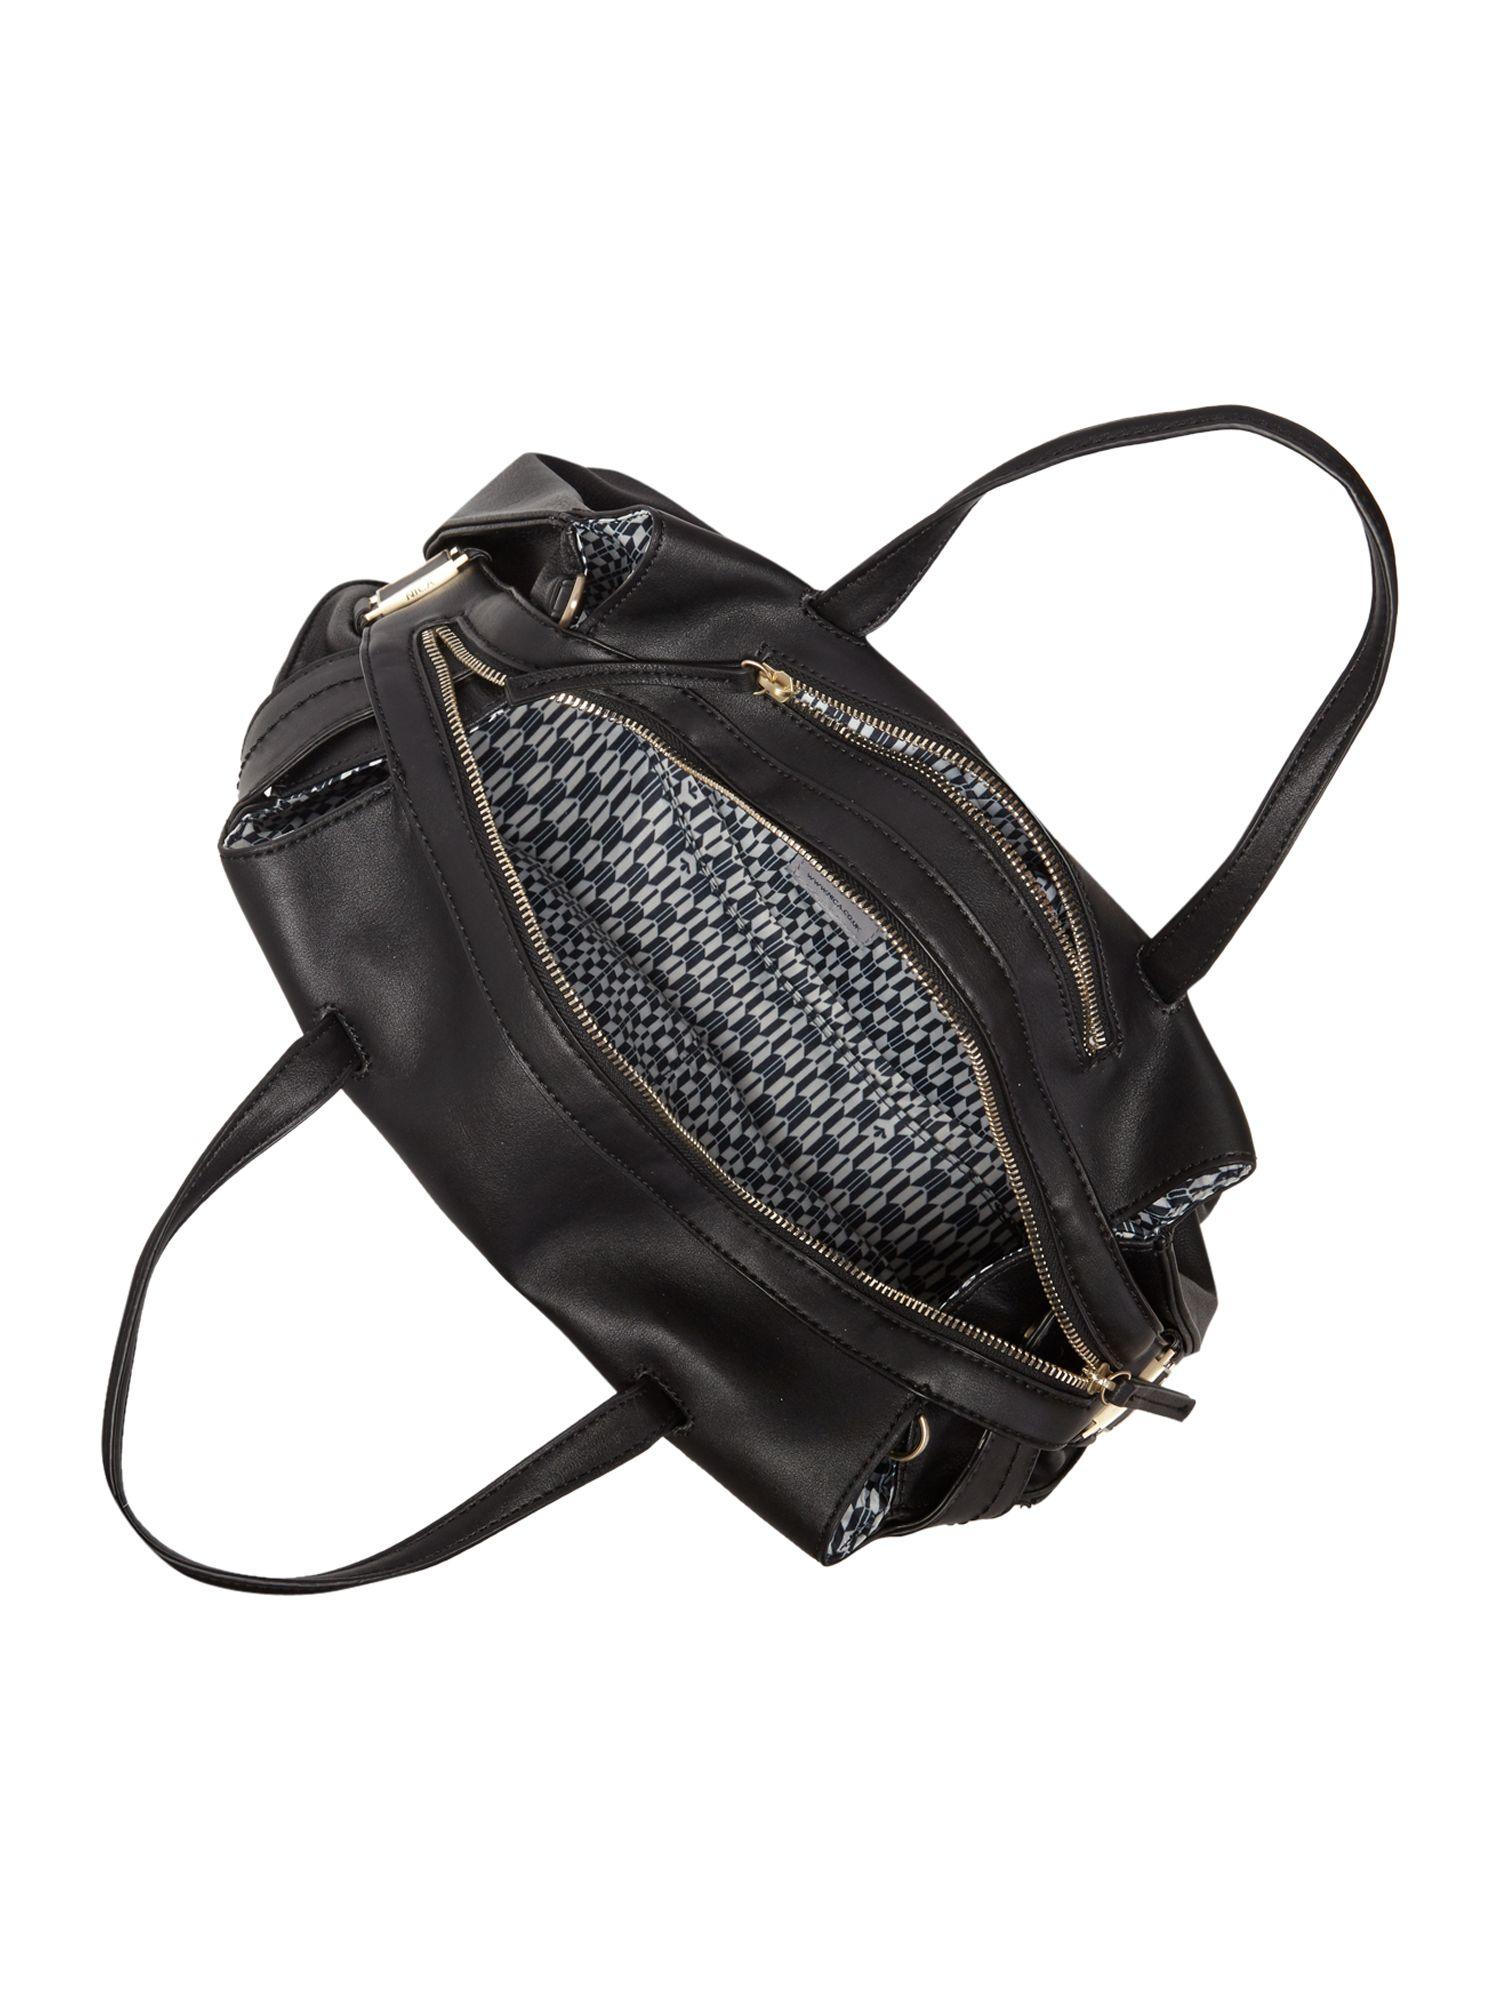 Nica Fia Black Tote Bag